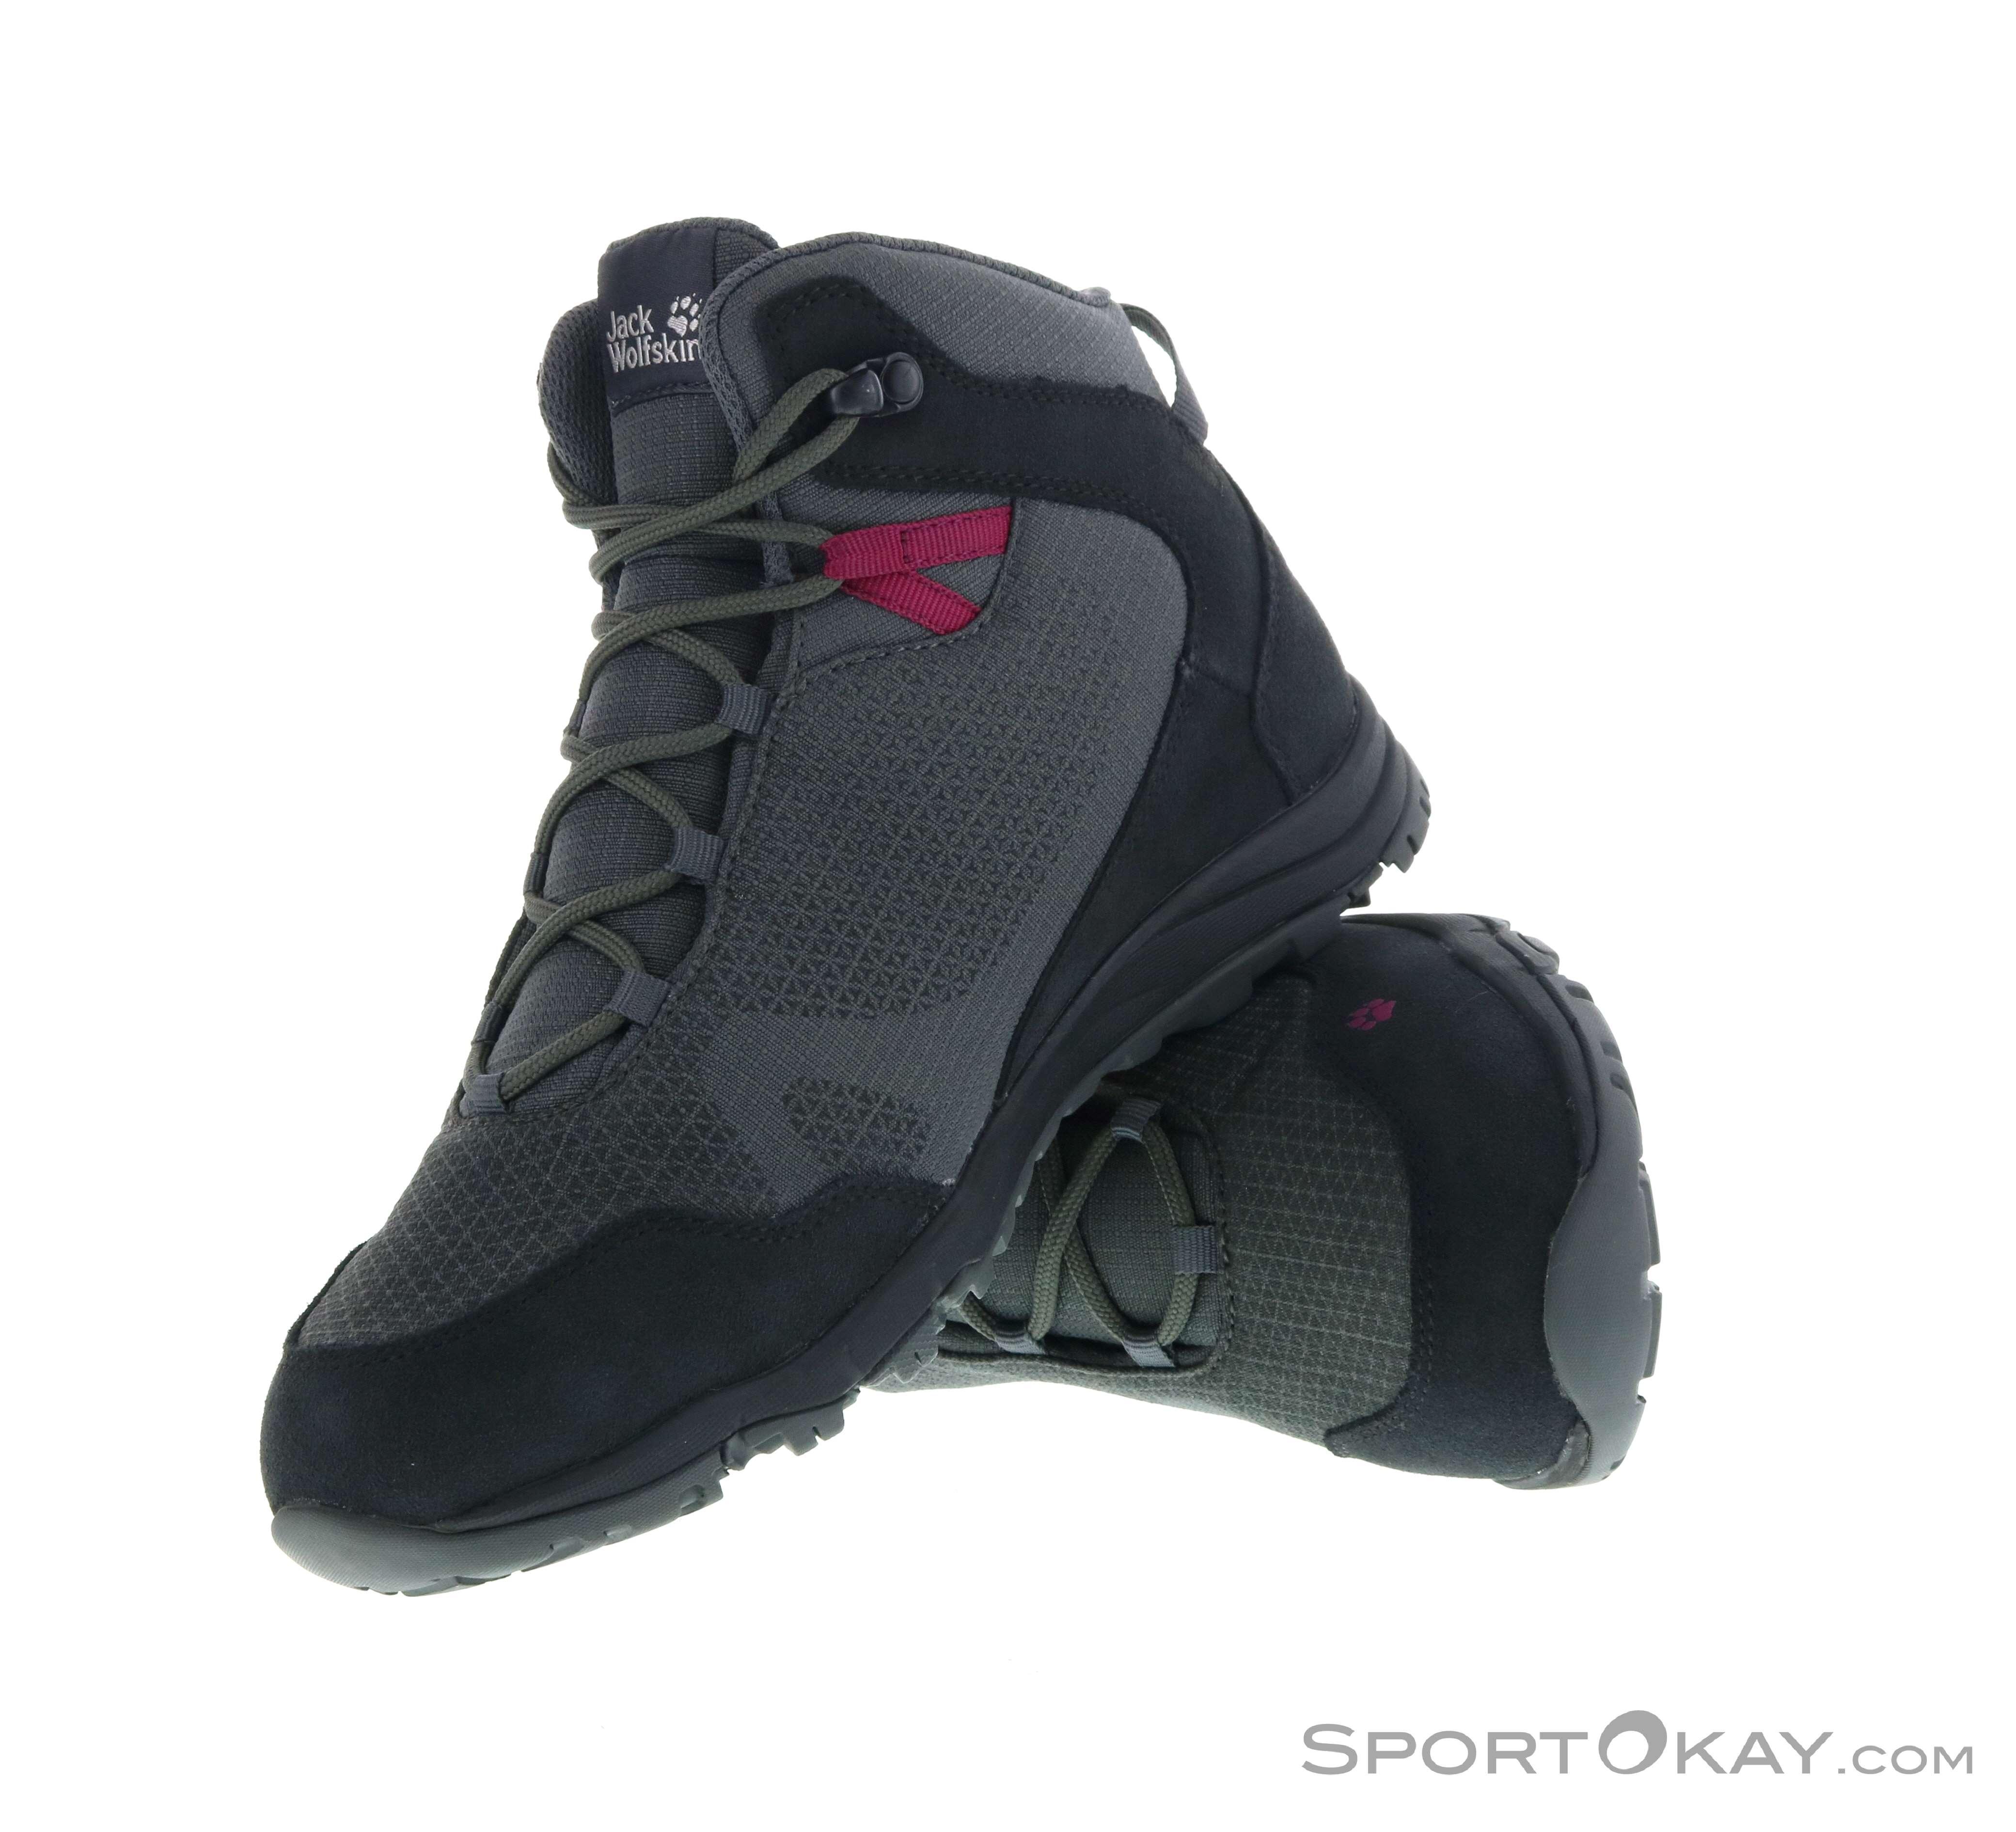 Jack Wolfskin Activate XT Texapore Mid Womens Hiking Boots 3HPdu